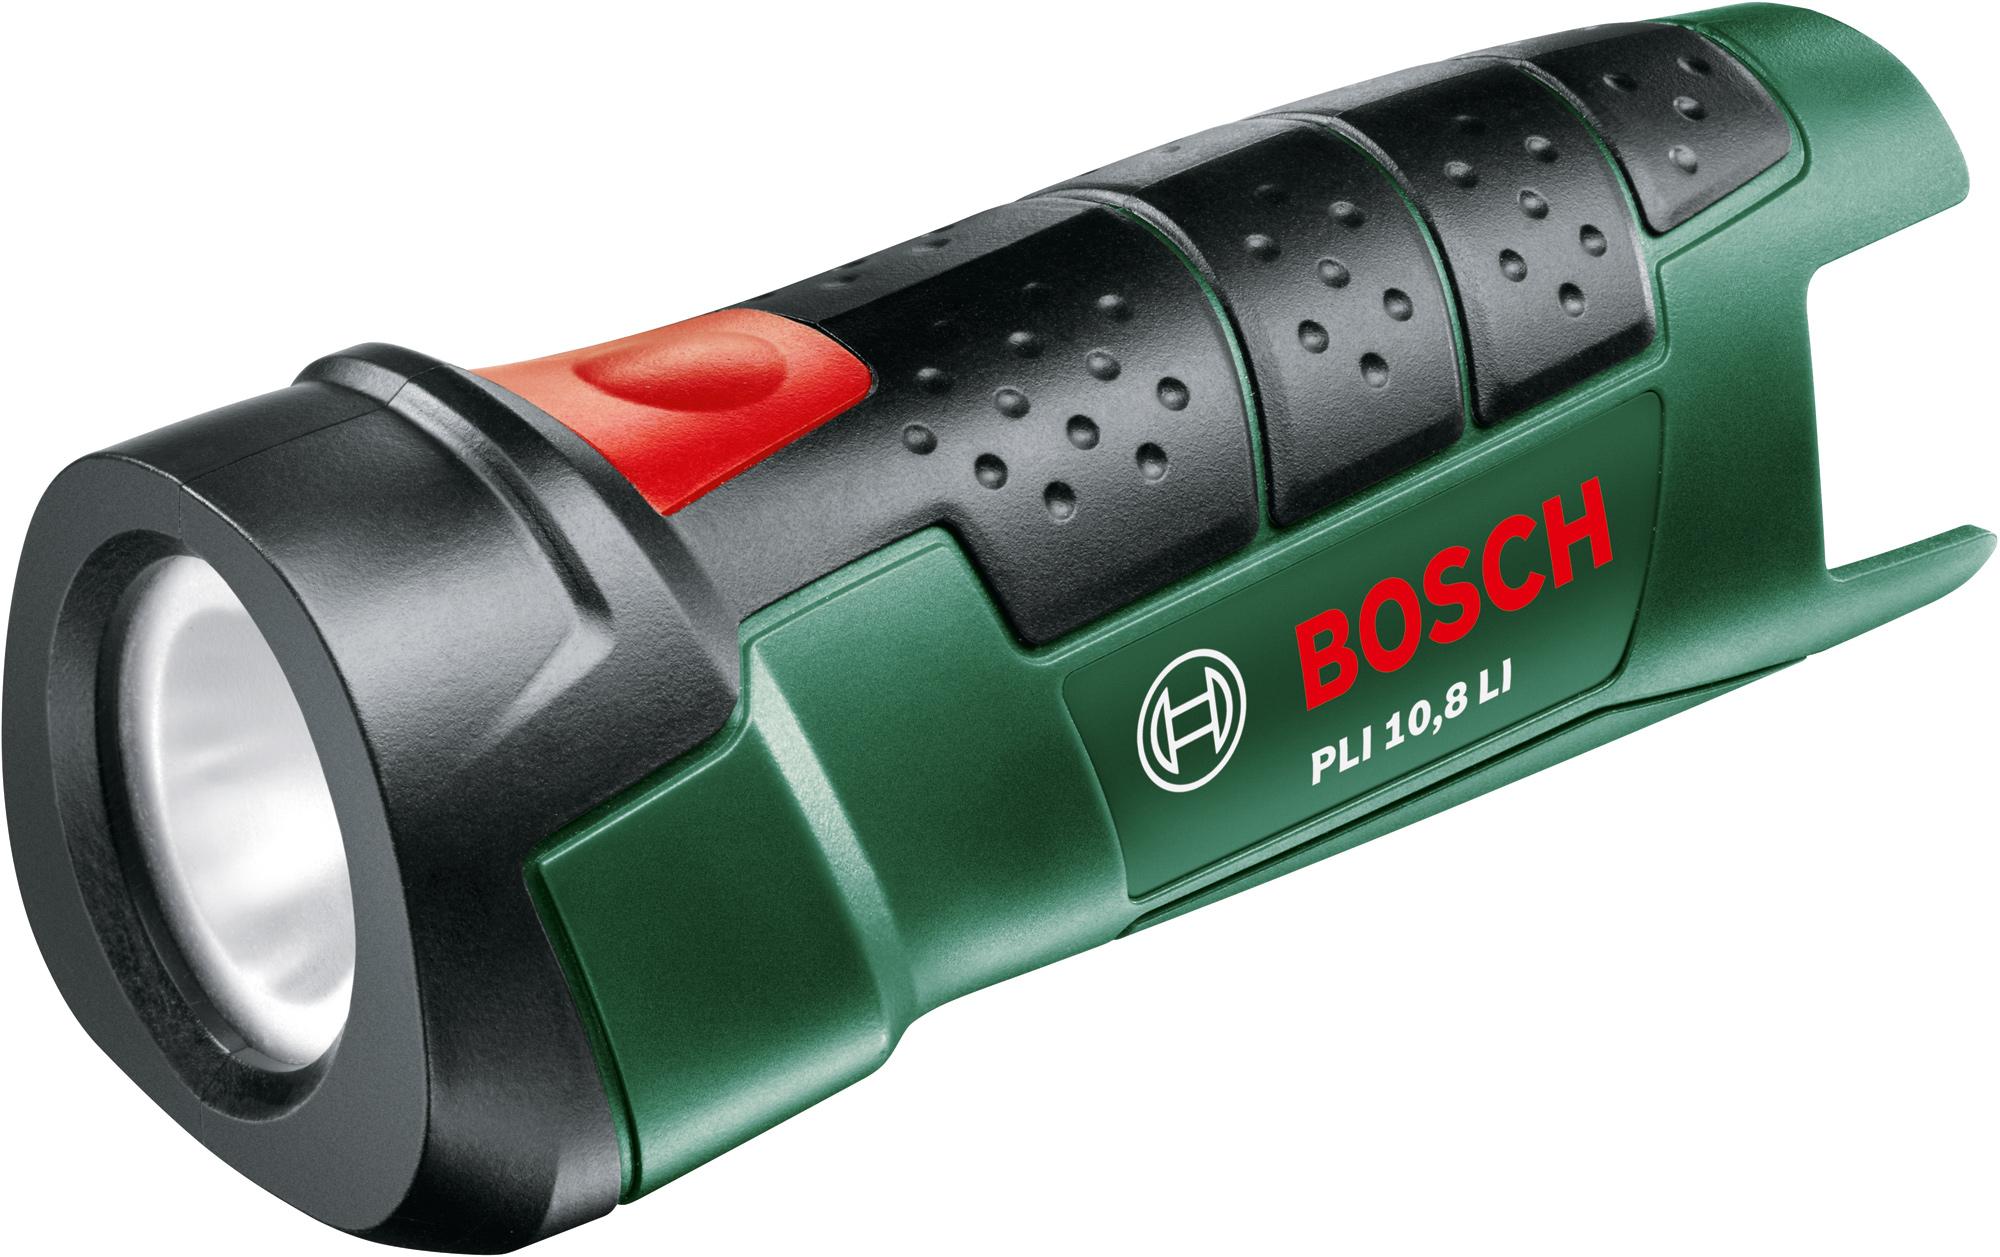 Купить Фонарь Bosch, PLI 10.8 Li (0.603.9A1.000), Китай